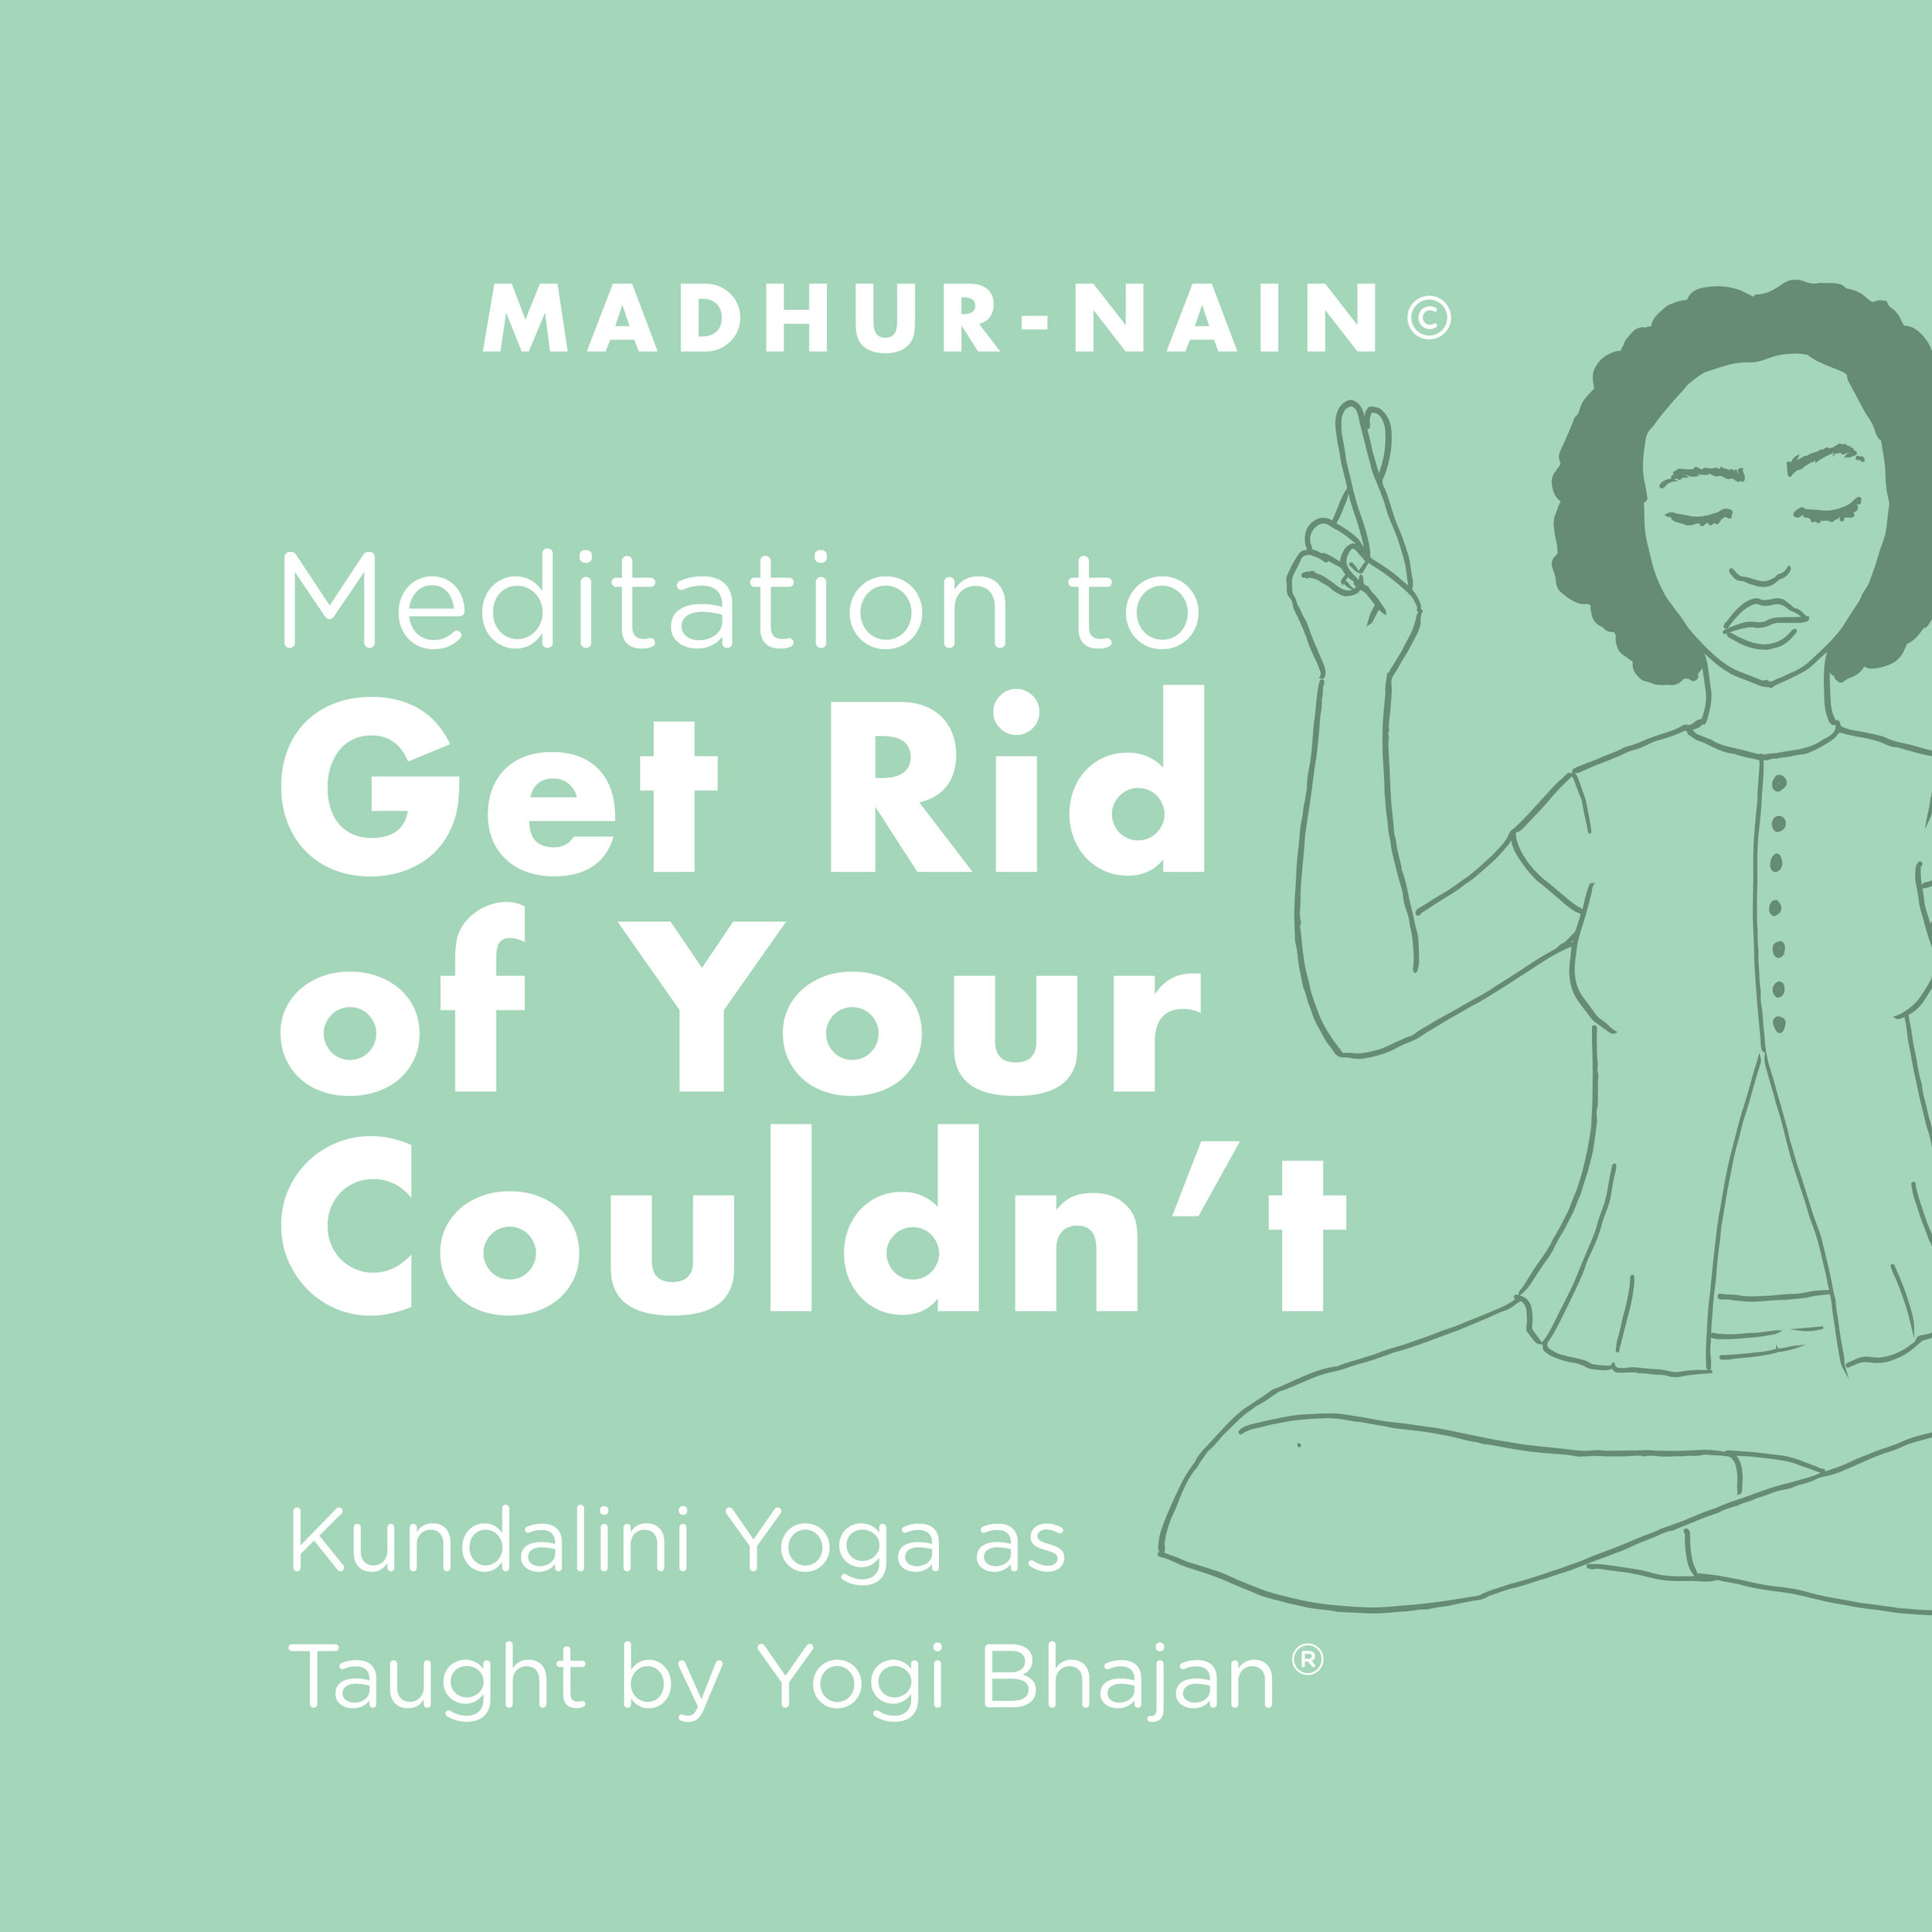 Meditation to Get-100.jpg